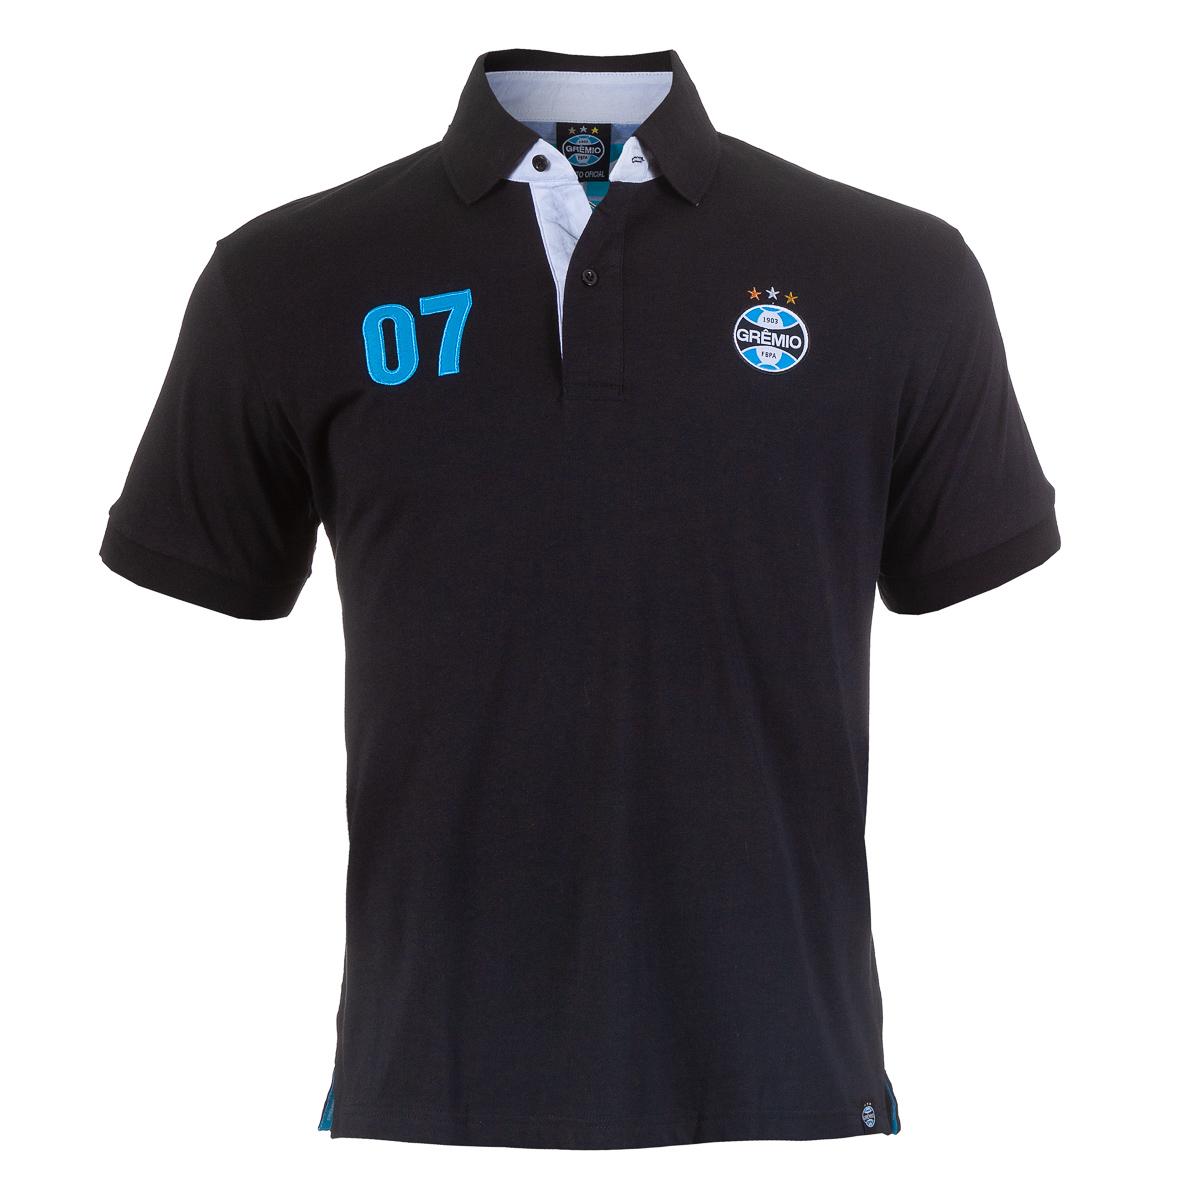 Pólo Masc. Grêmio Casual - Preto/Azul